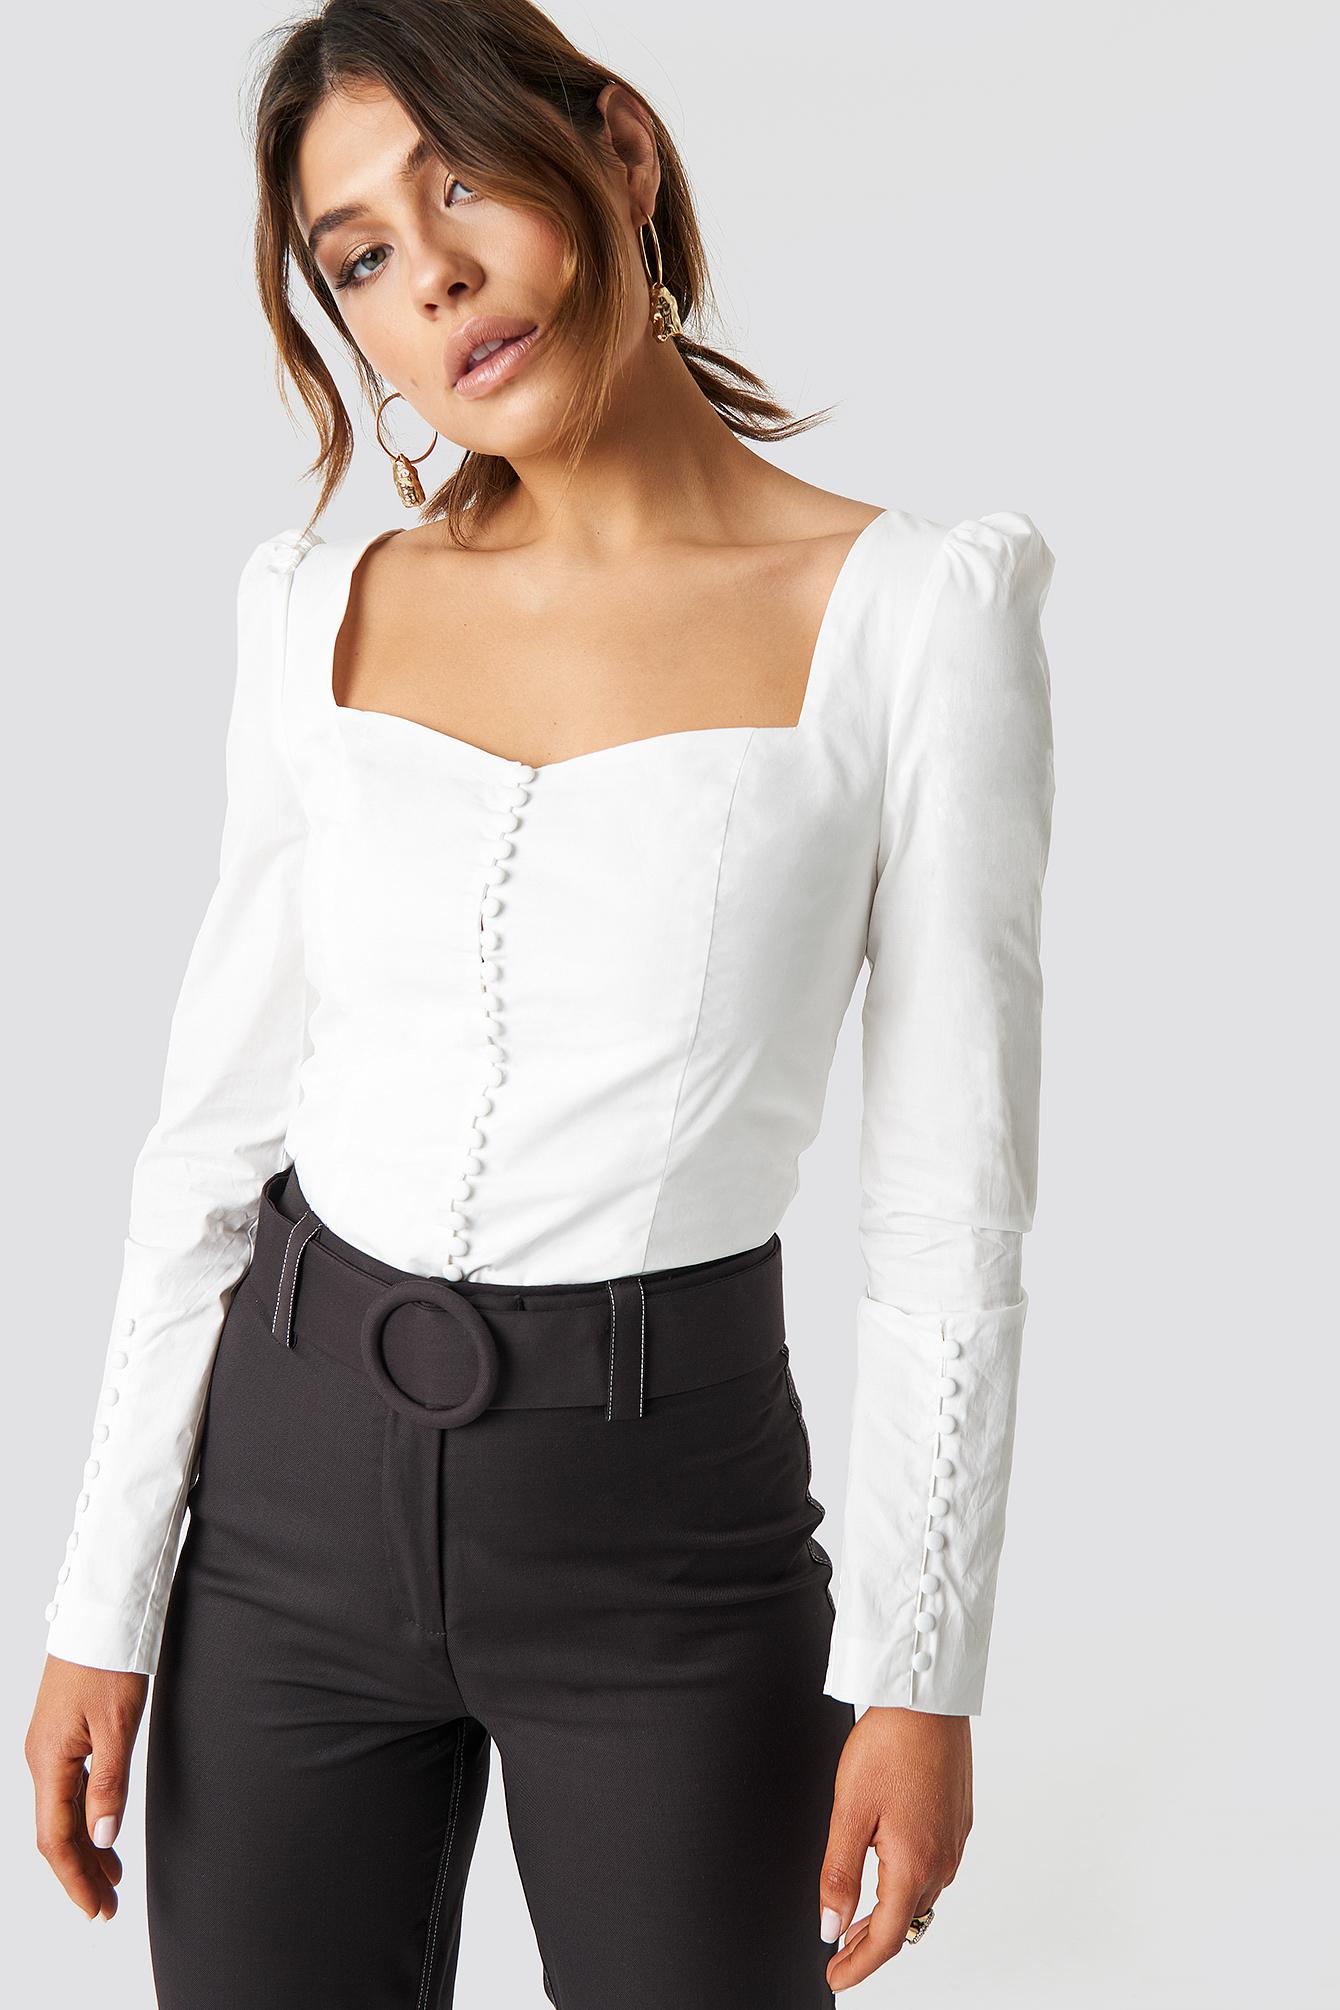 milena karl x na-kd -  Buttons Squared Blouse - White